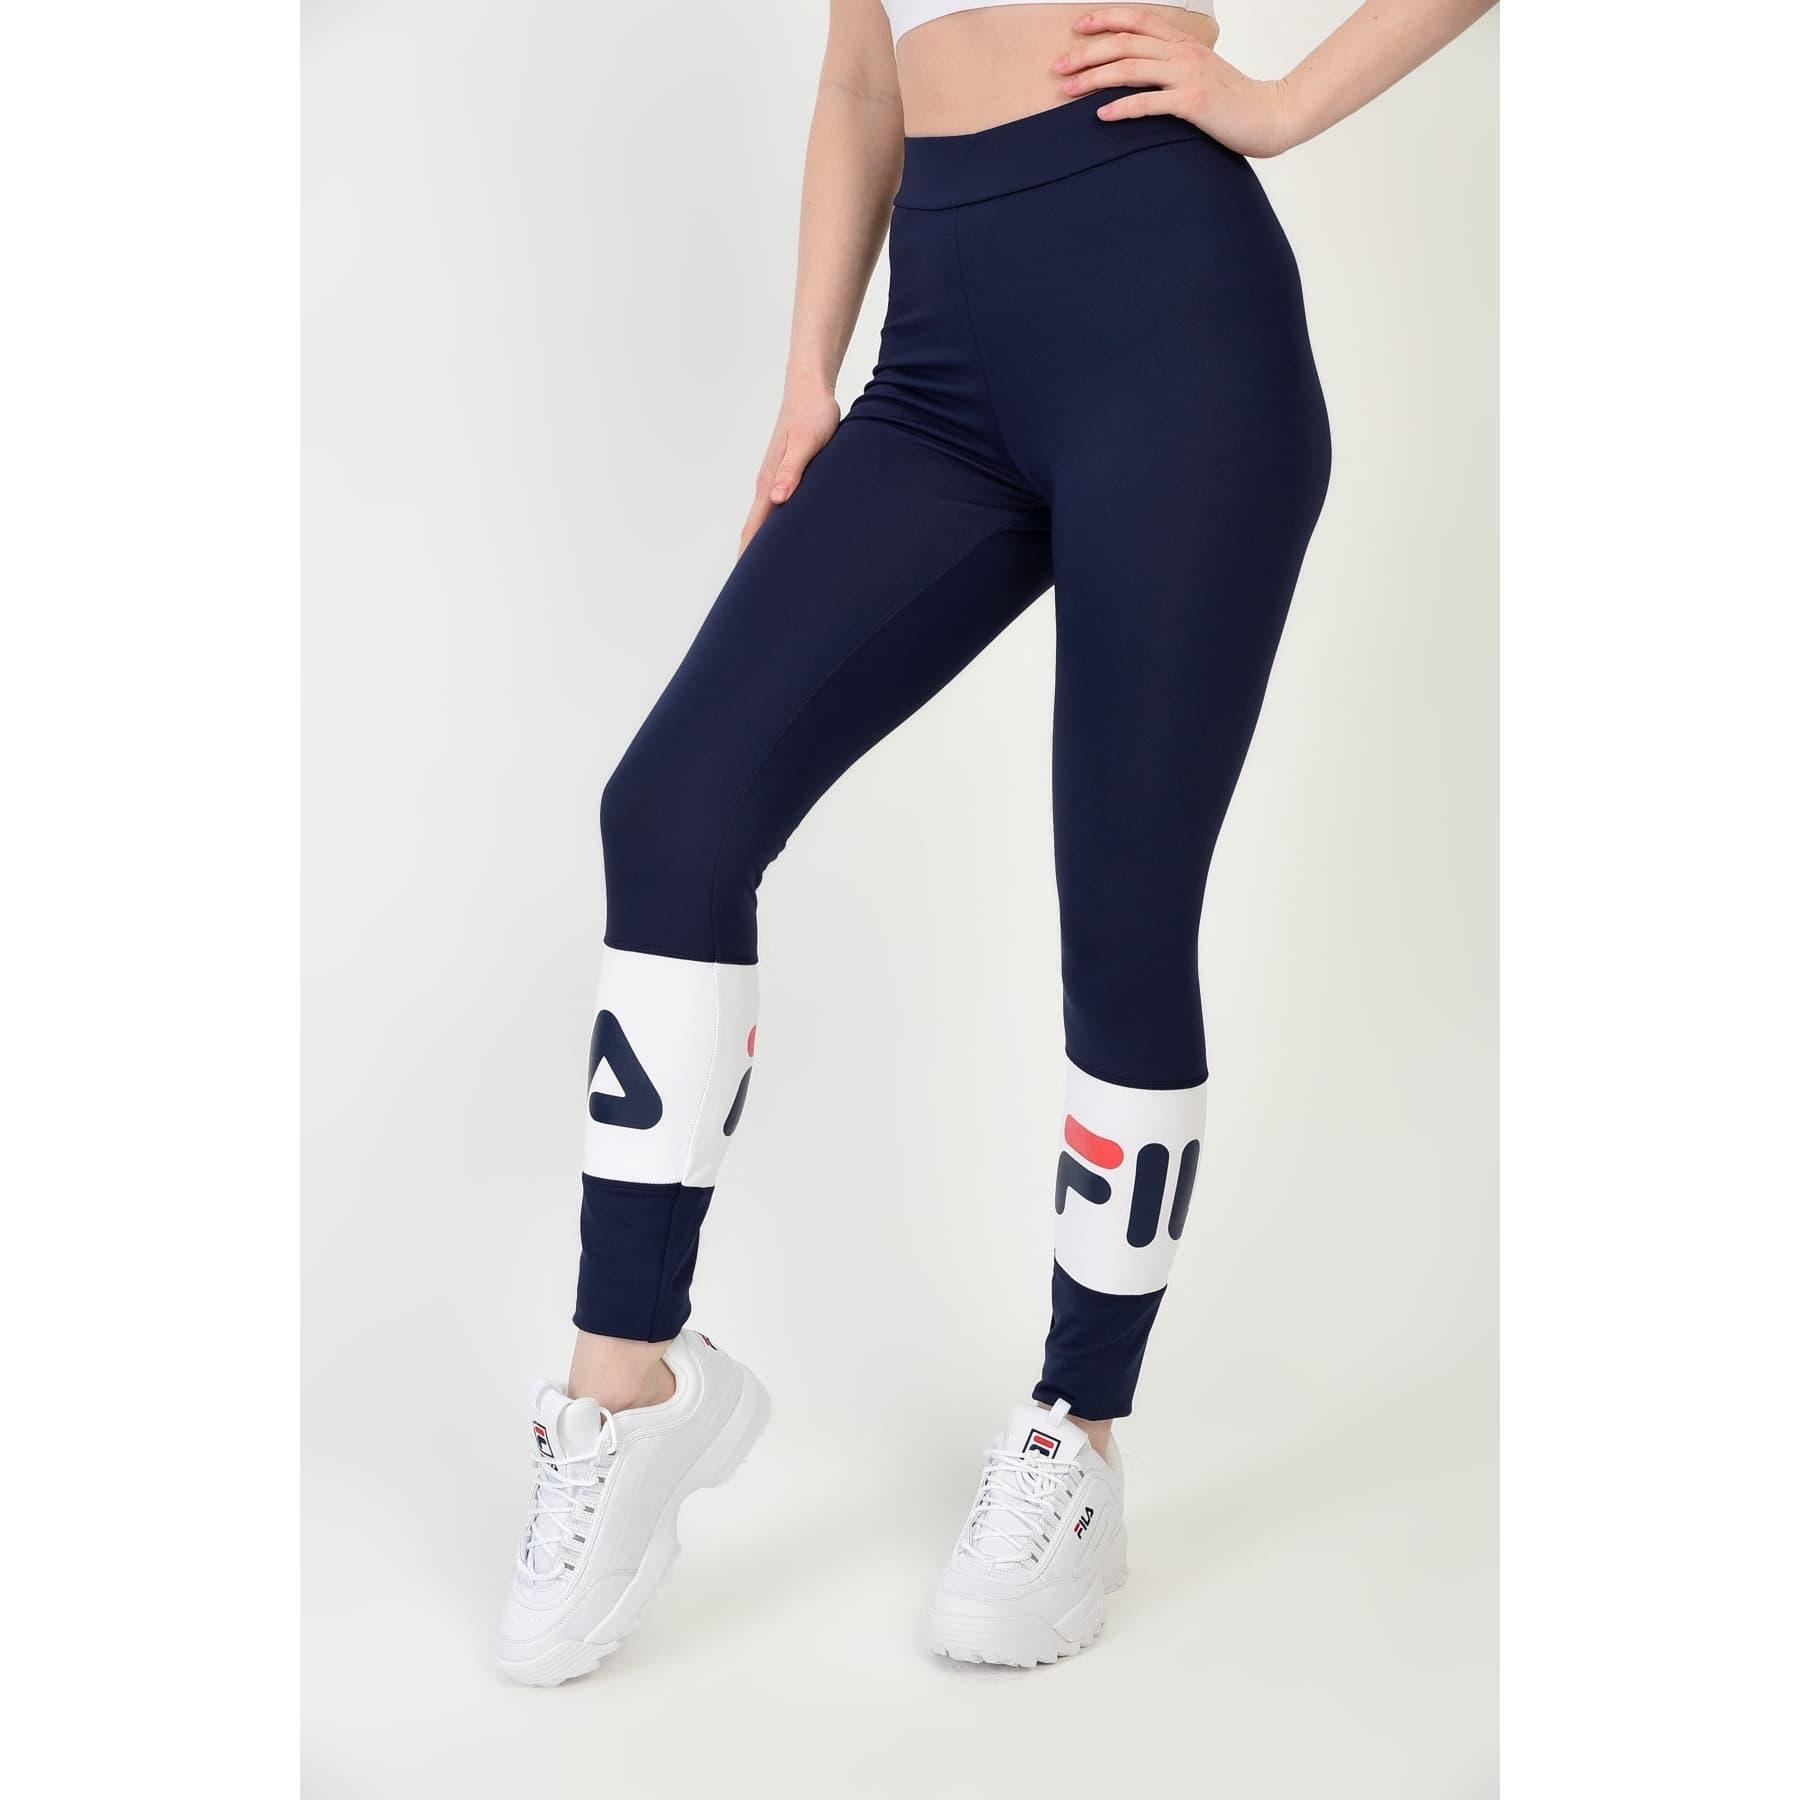 Ballari Kadın Lacivert Spor Tayt (687730_G13)